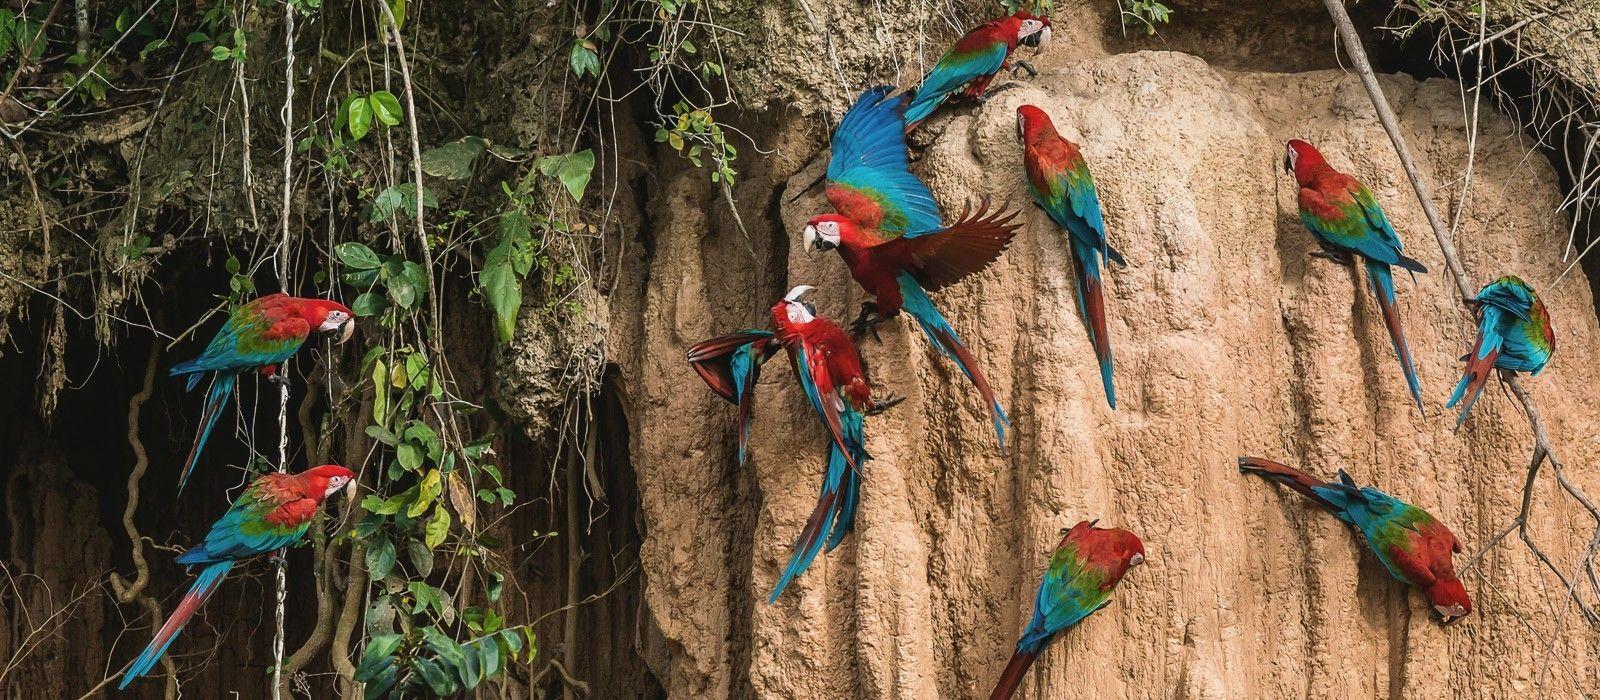 Brazil's Wildlife & Natural Wonders Tour Trip 2